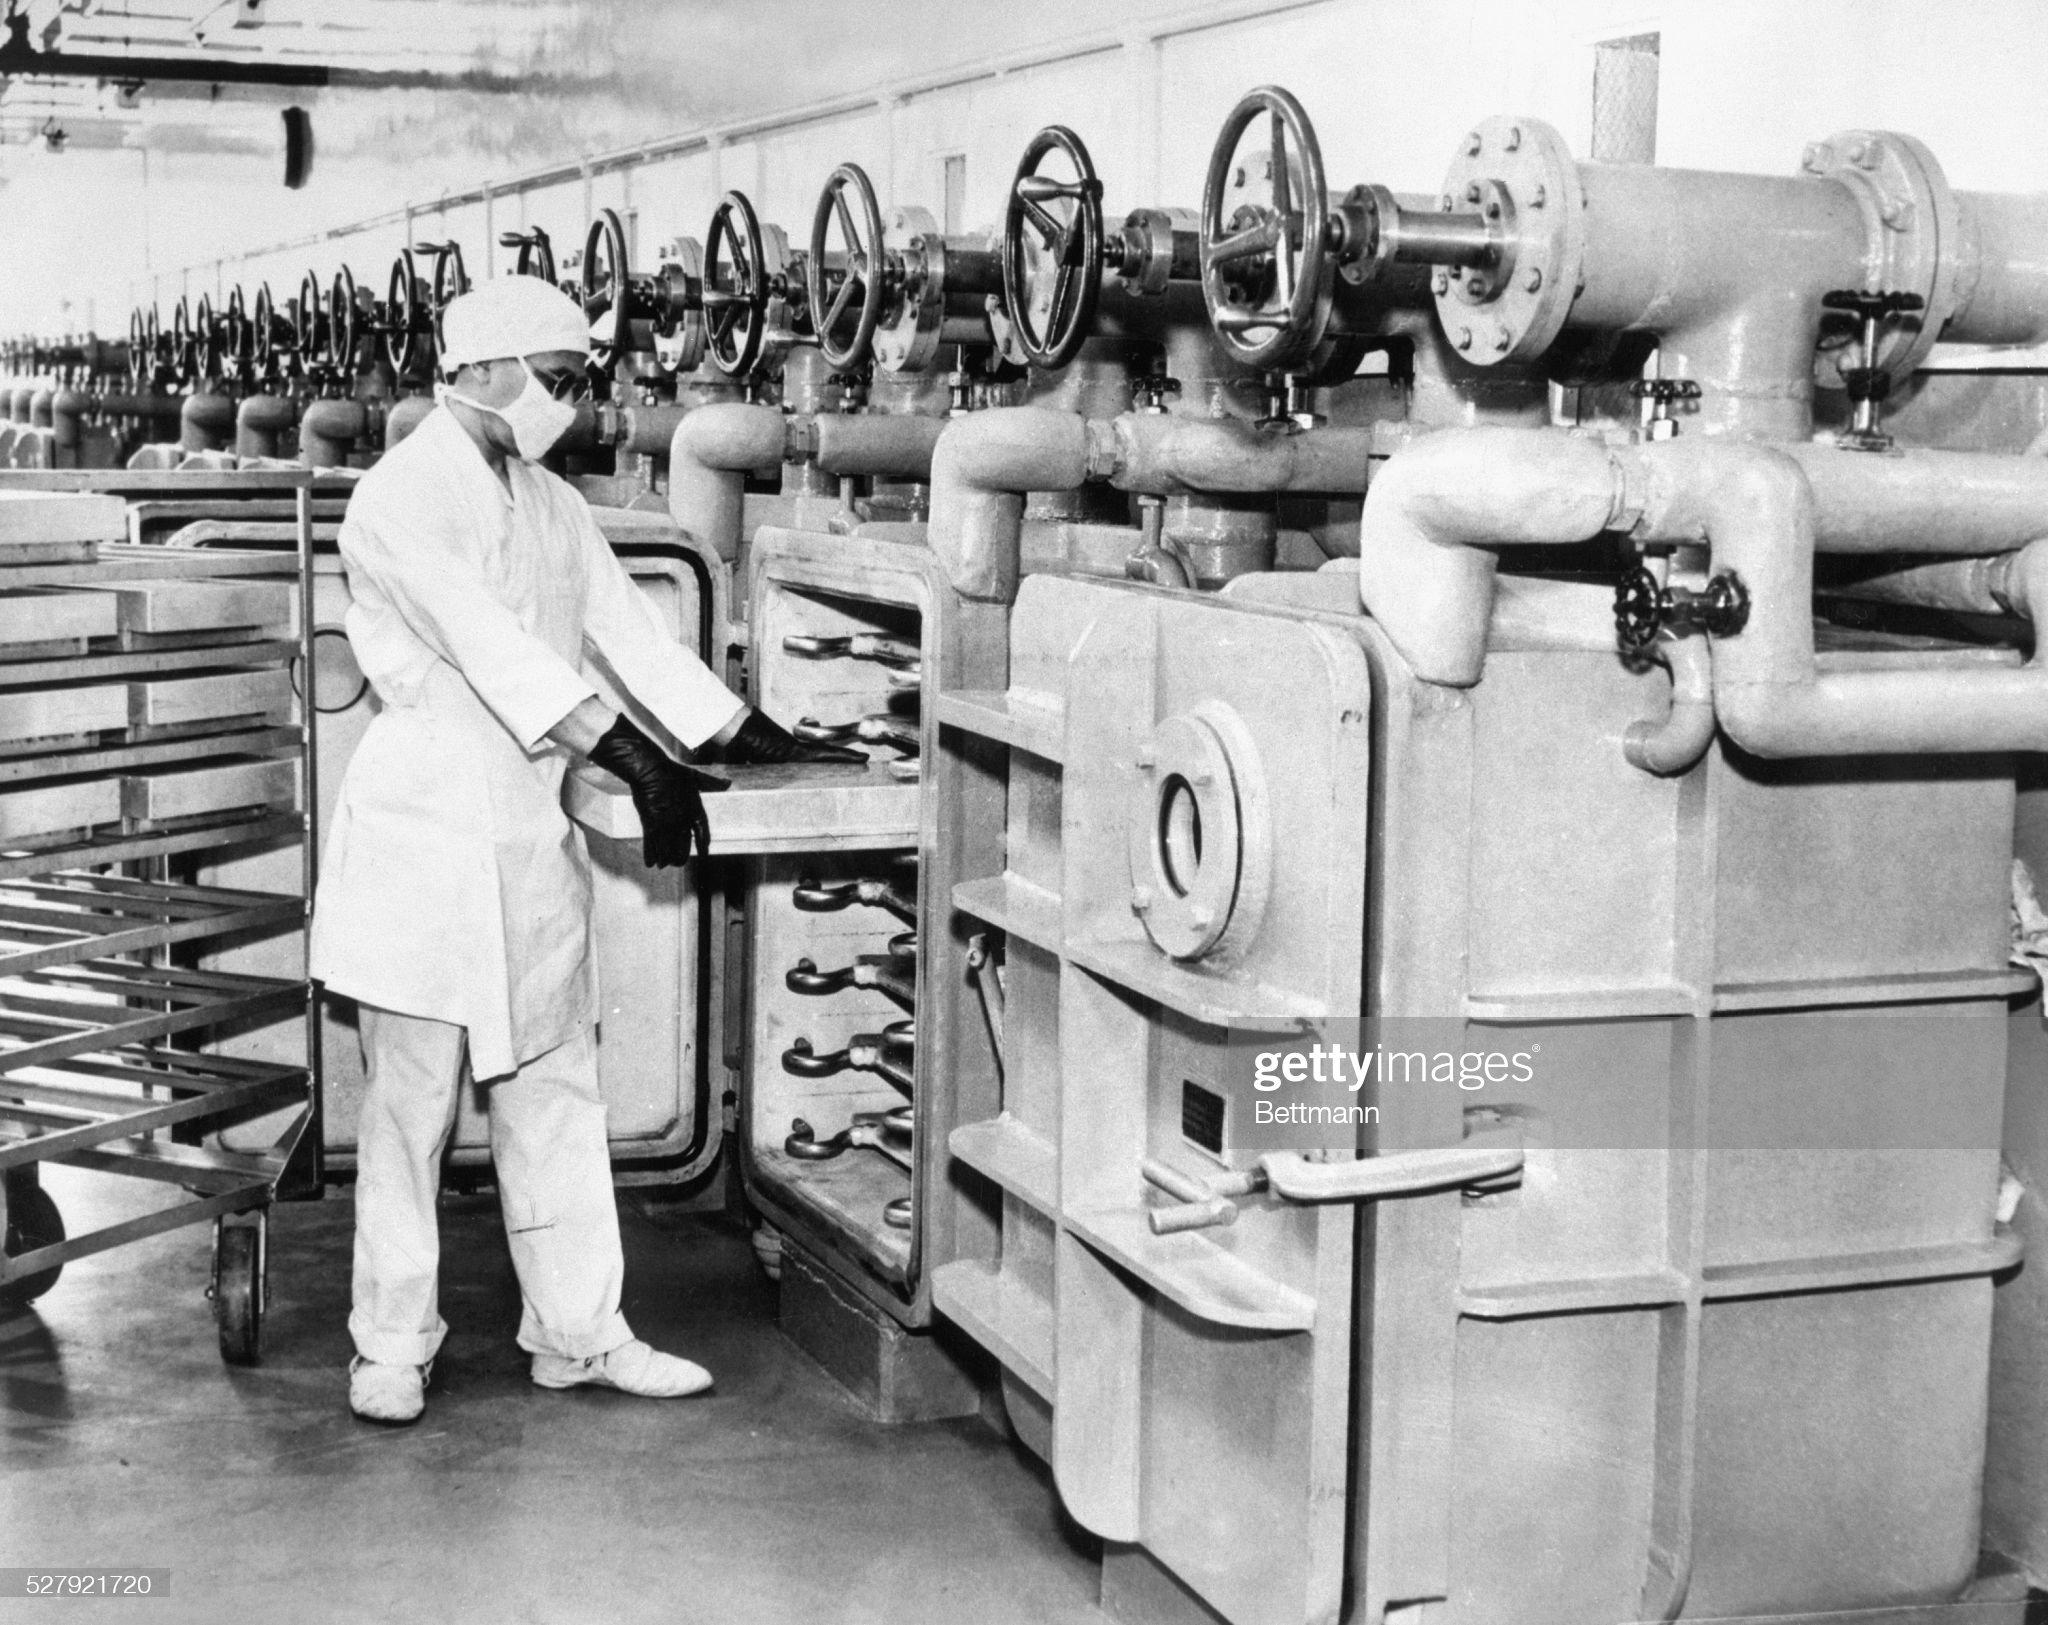 Worker Preparing Penicillin : News Photo